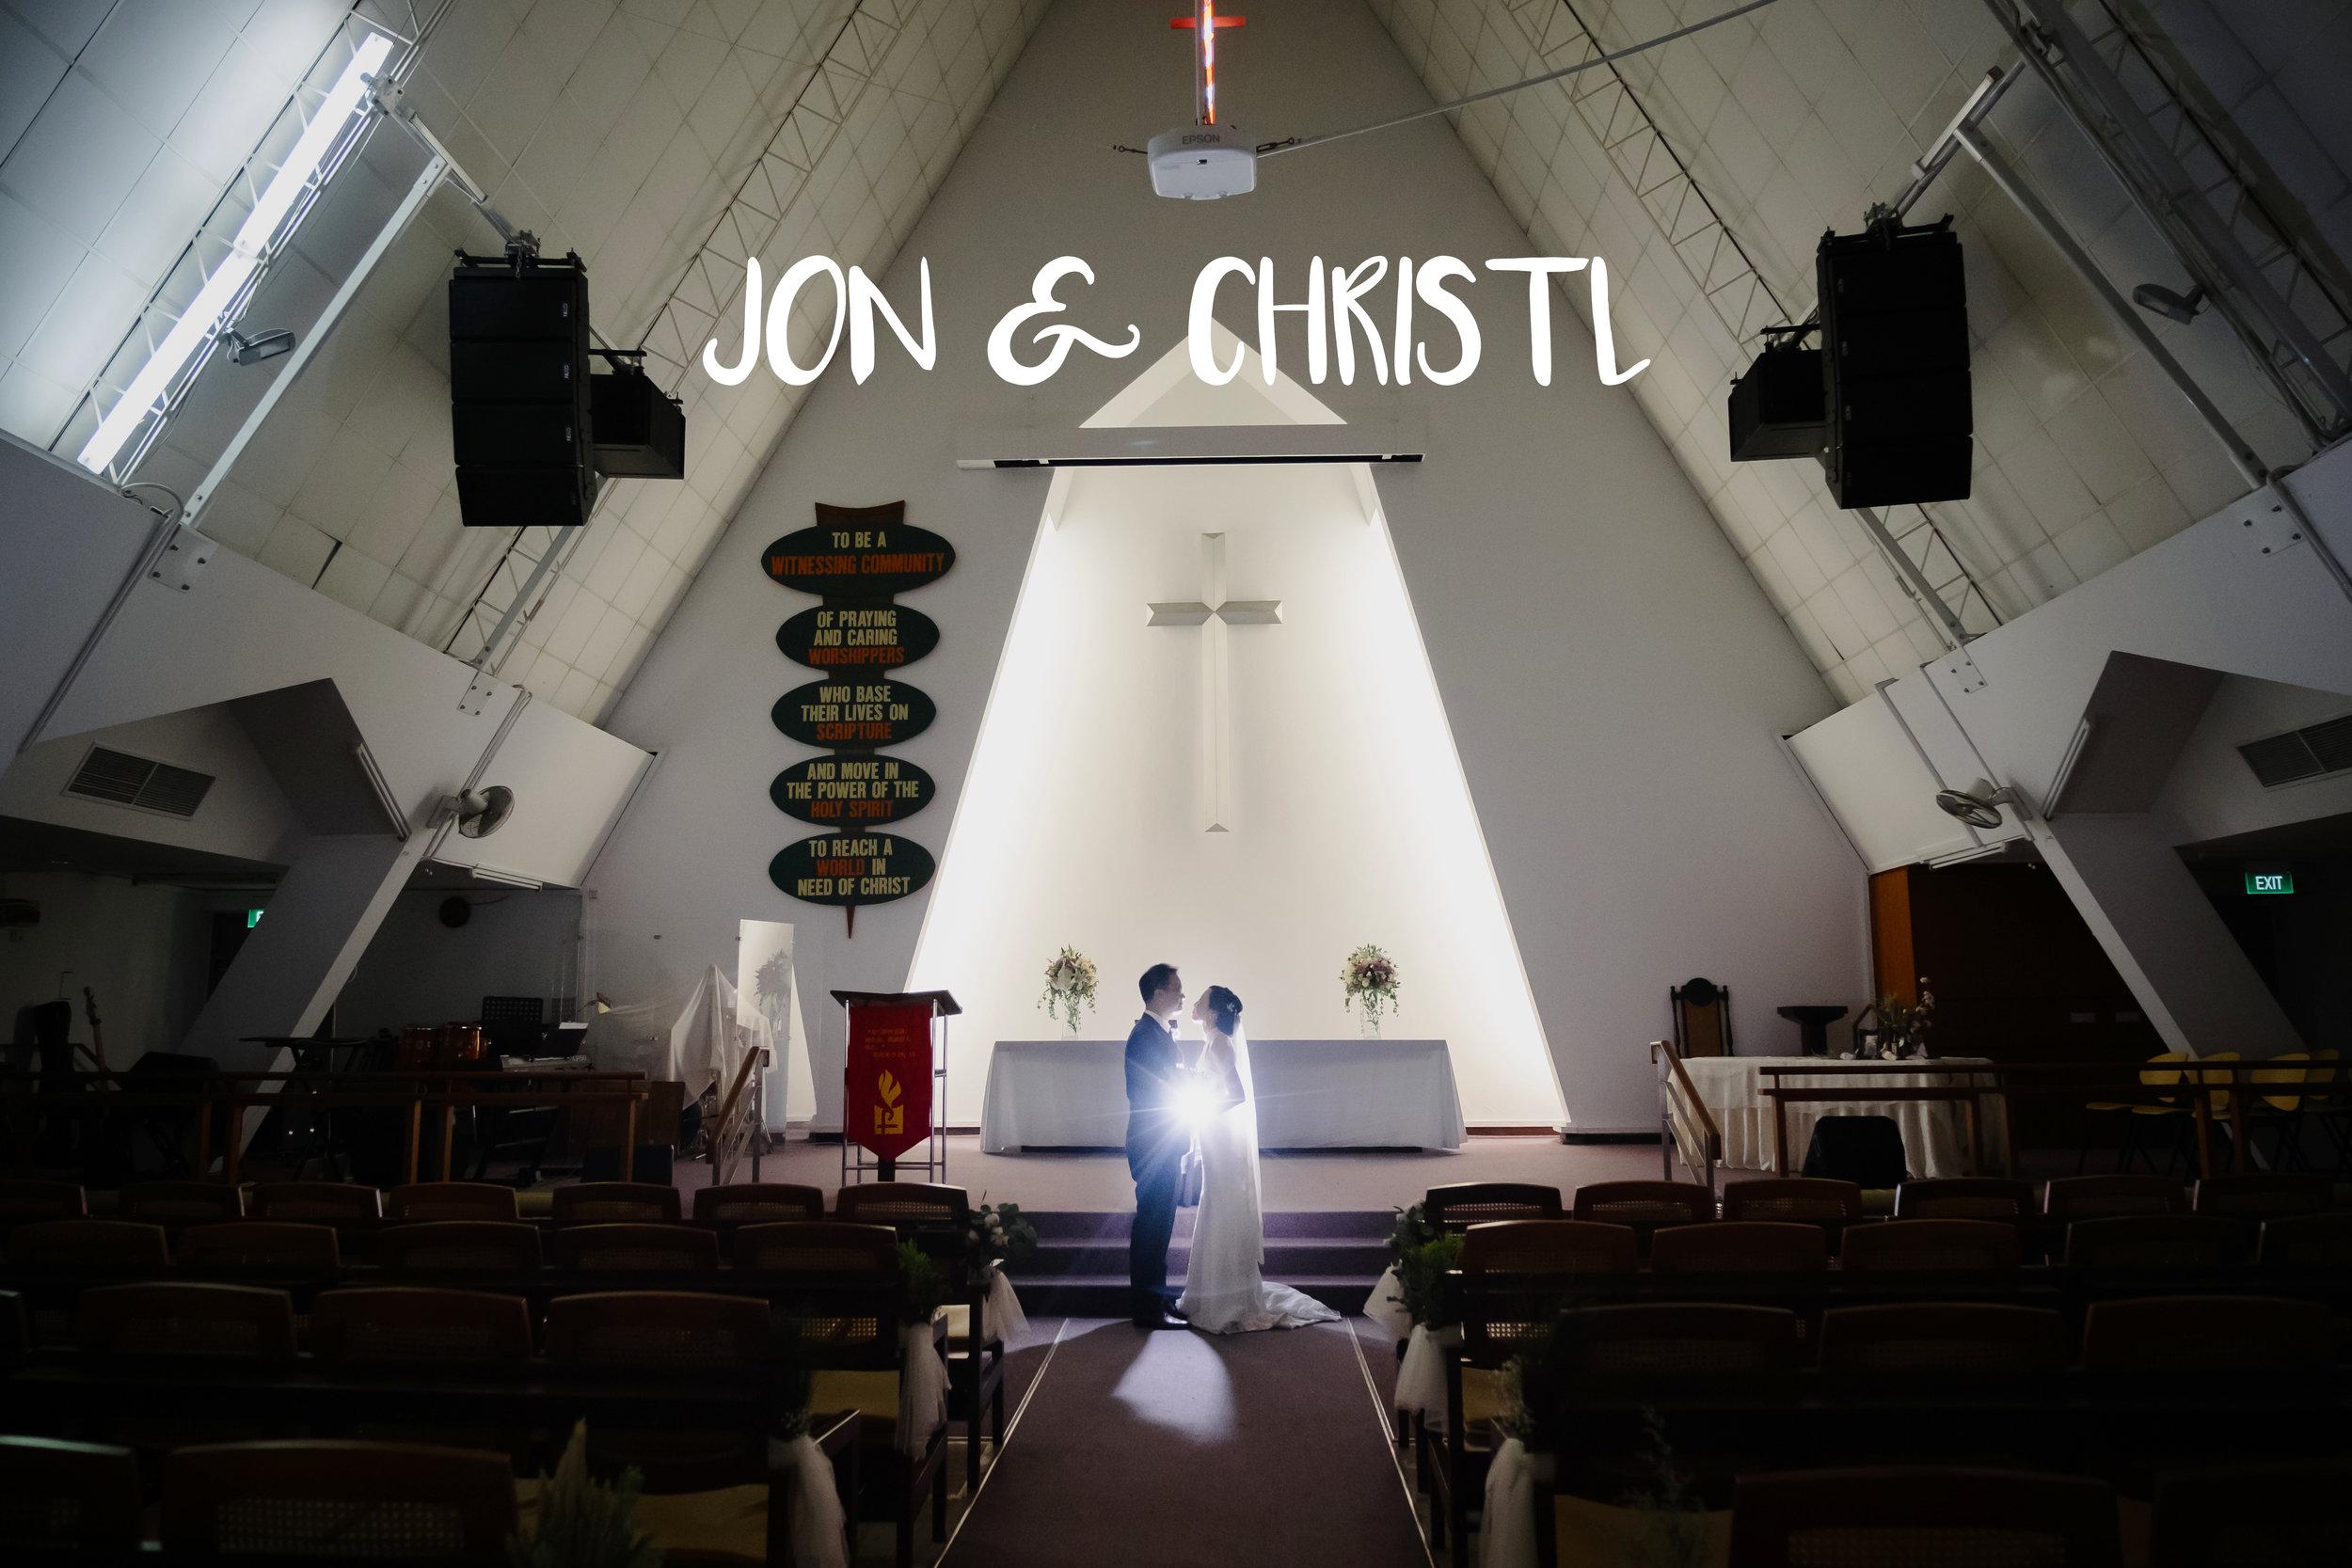 Jon n Christl